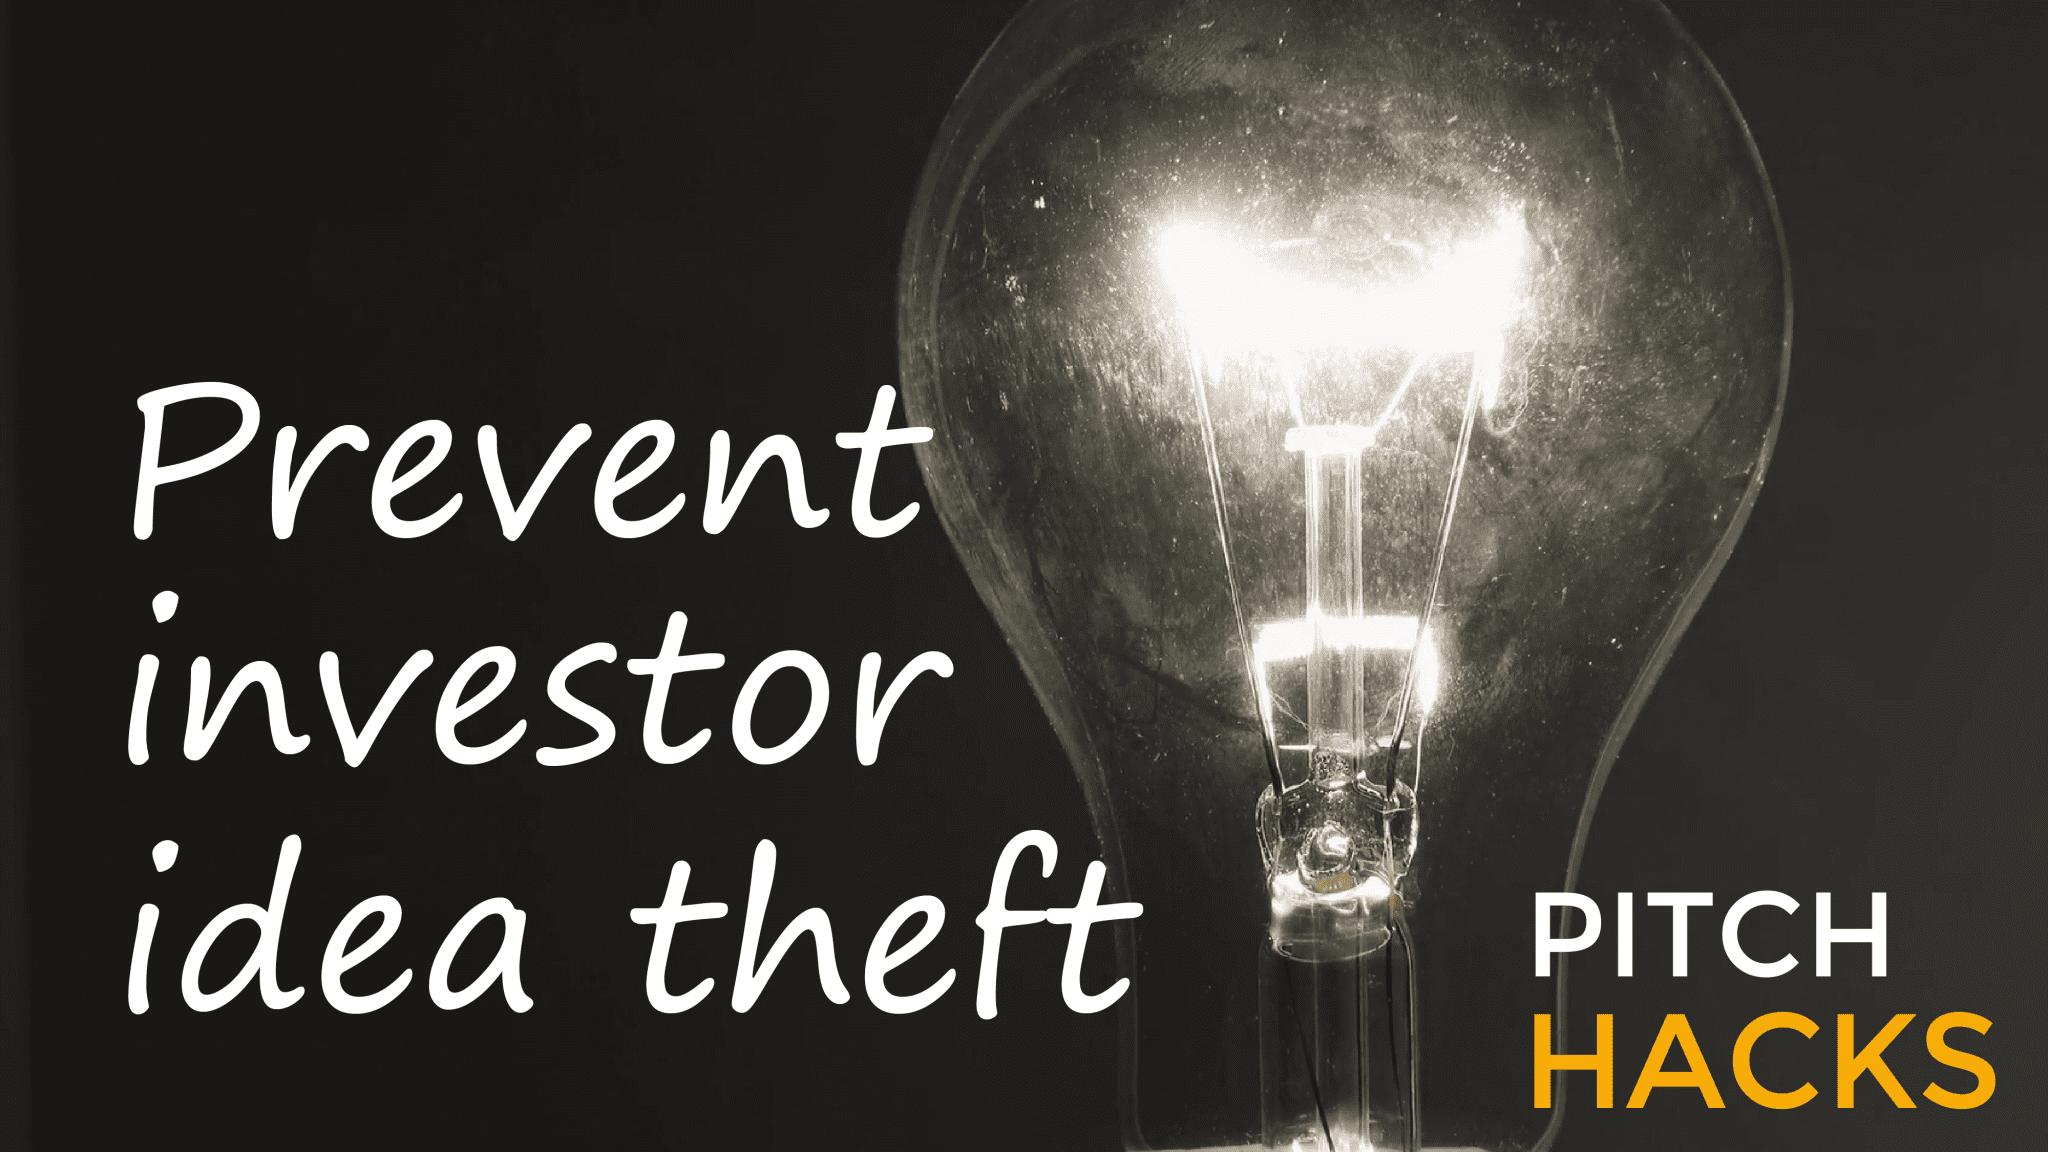 Investor Idea Theft